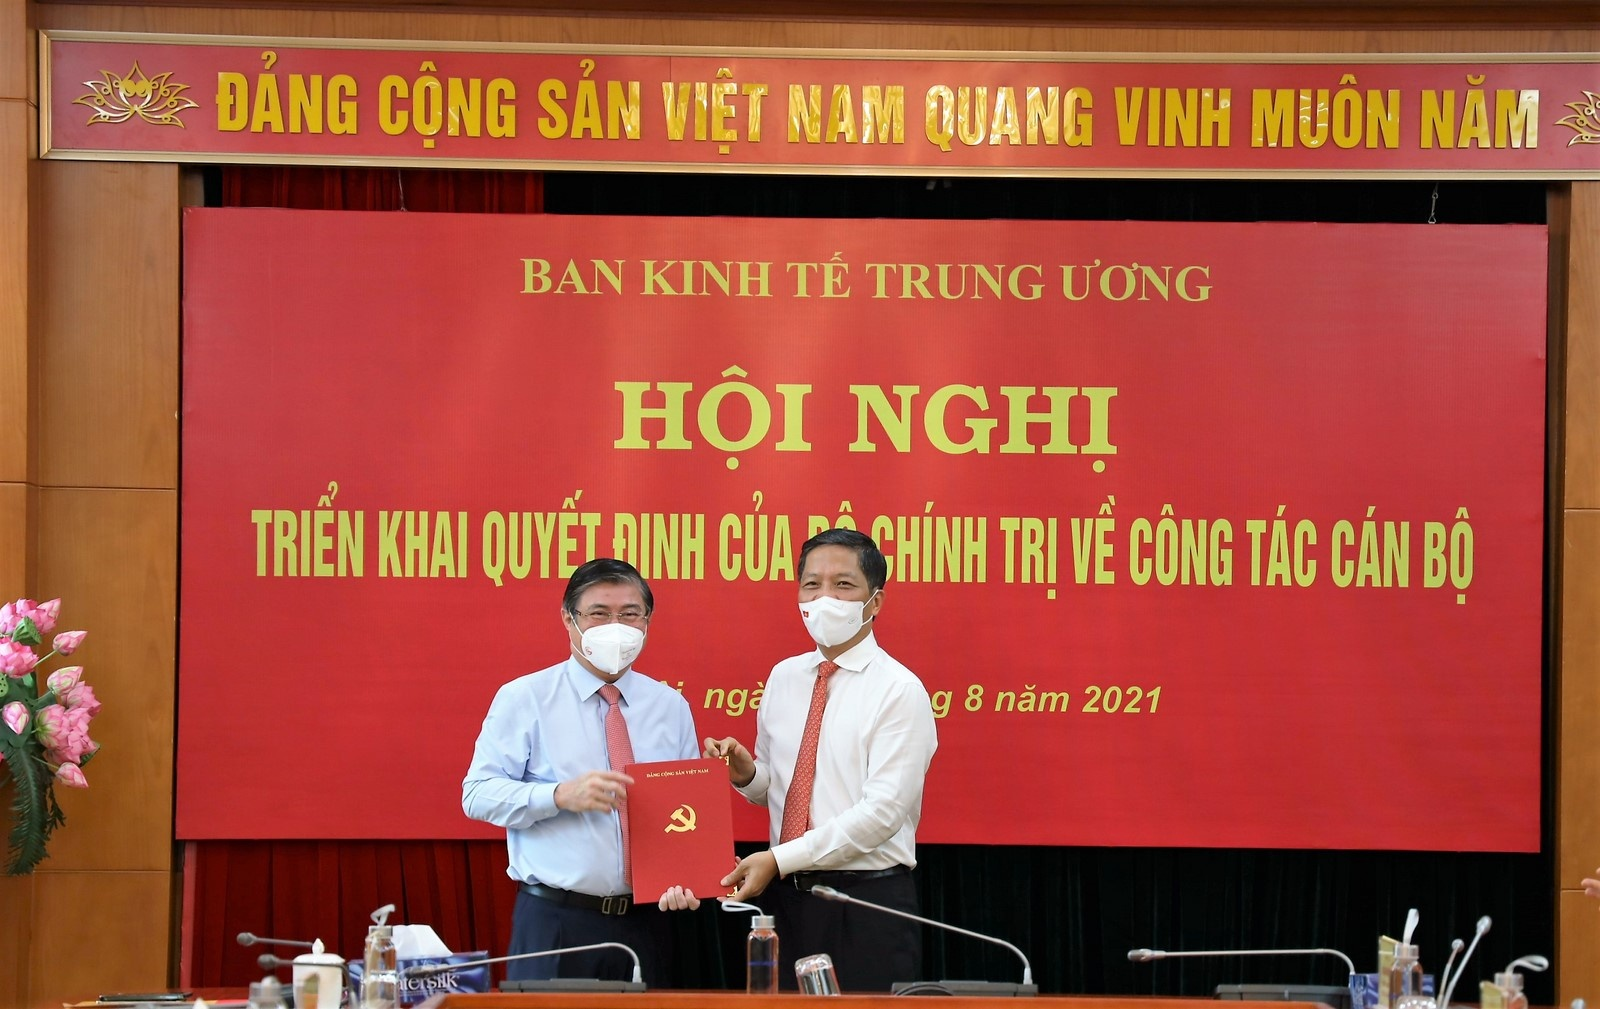 trao quyet dinh dieu dong dong chi nguyen thanh phong giu chuc pho truong ban kinh te trung uong